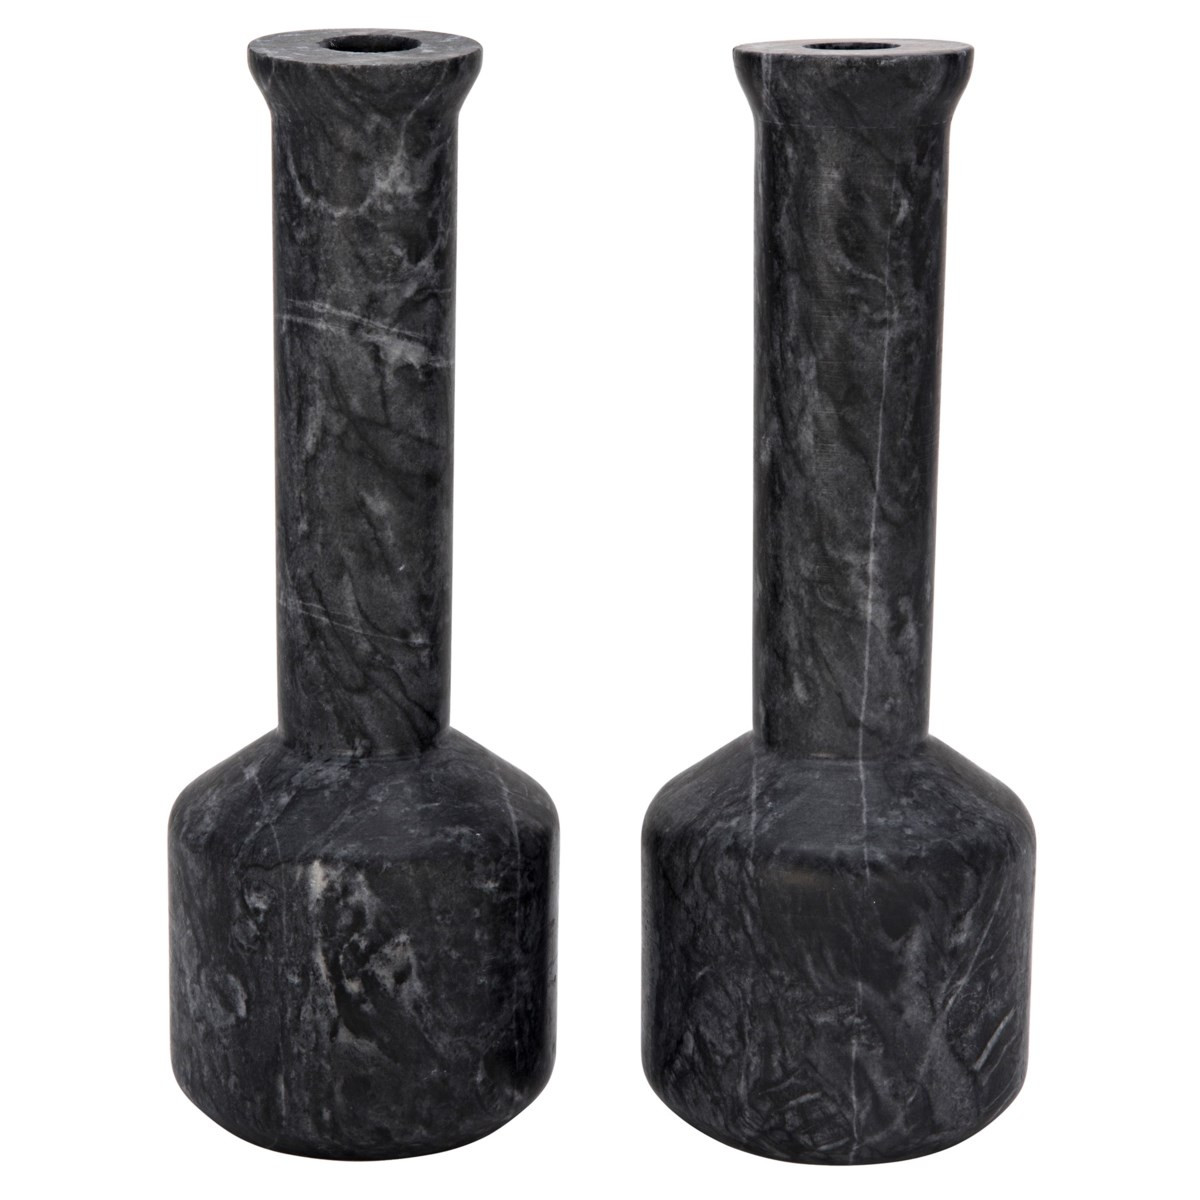 Markos Decorative Candle Holder, Set Of 2, Black Marble